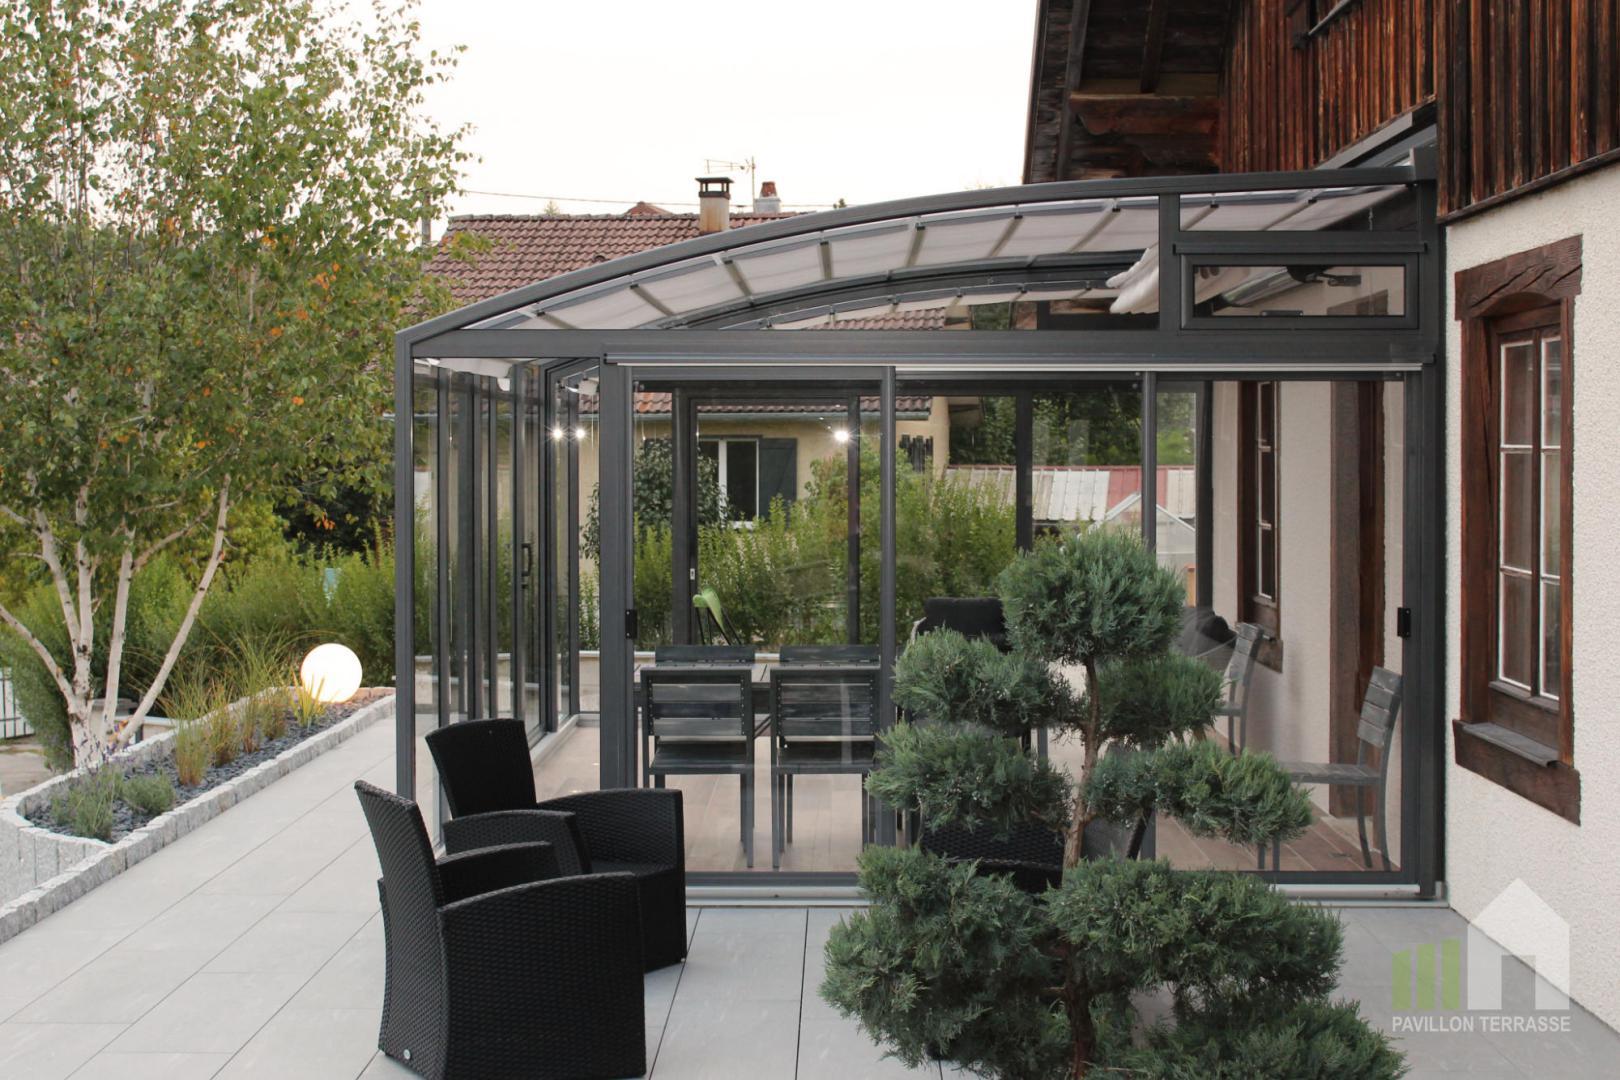 Abris Terrasse Pavillon I Solar Véranda Voroka Coulissante ... à Abri Pour Terrasse